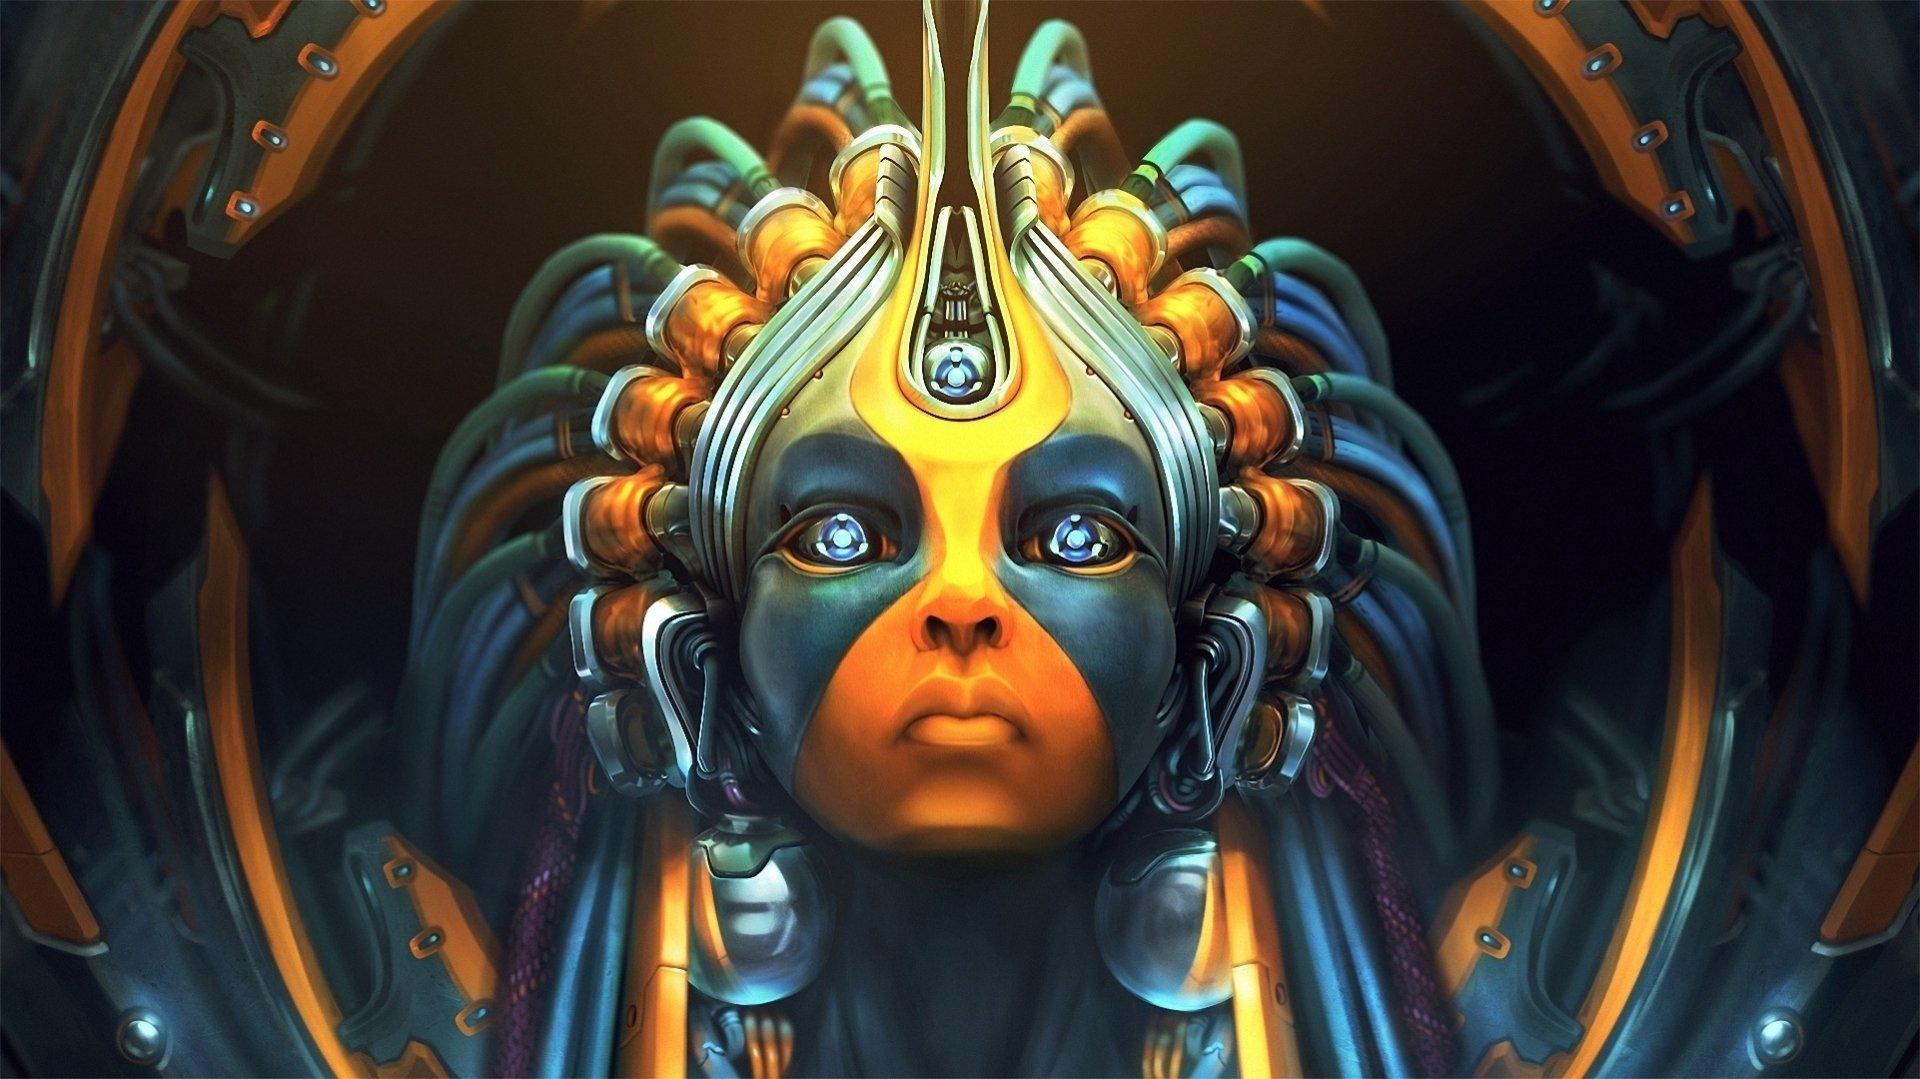 Sci Fi - Cyborg  Fantasy Wallpaper